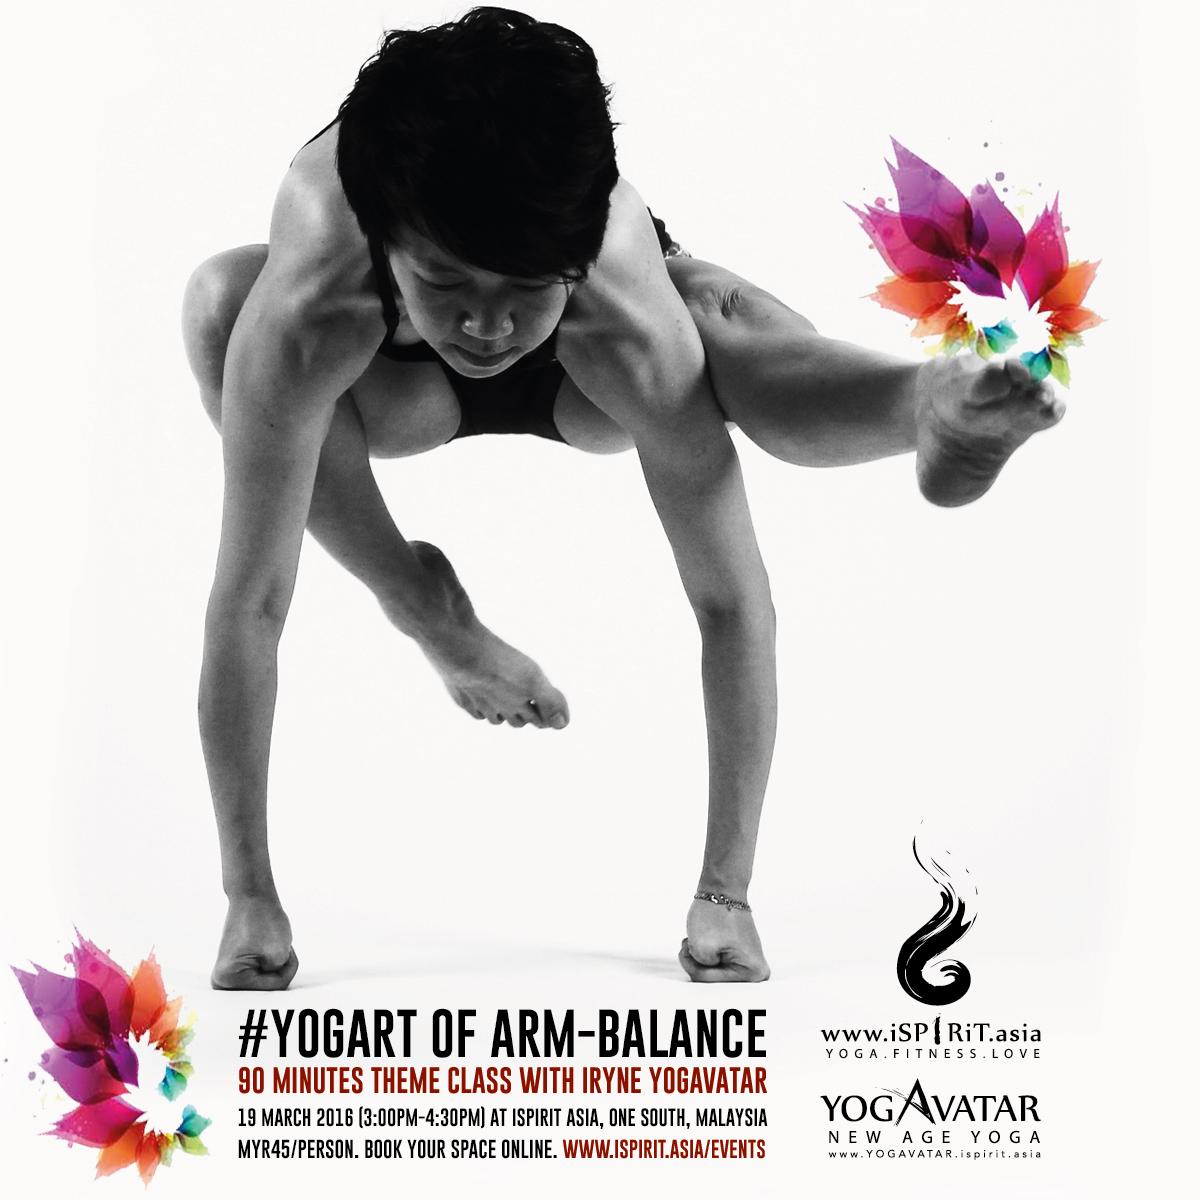 Yogurt of arm balance: theme class with iRyne Yogavatar poster v1